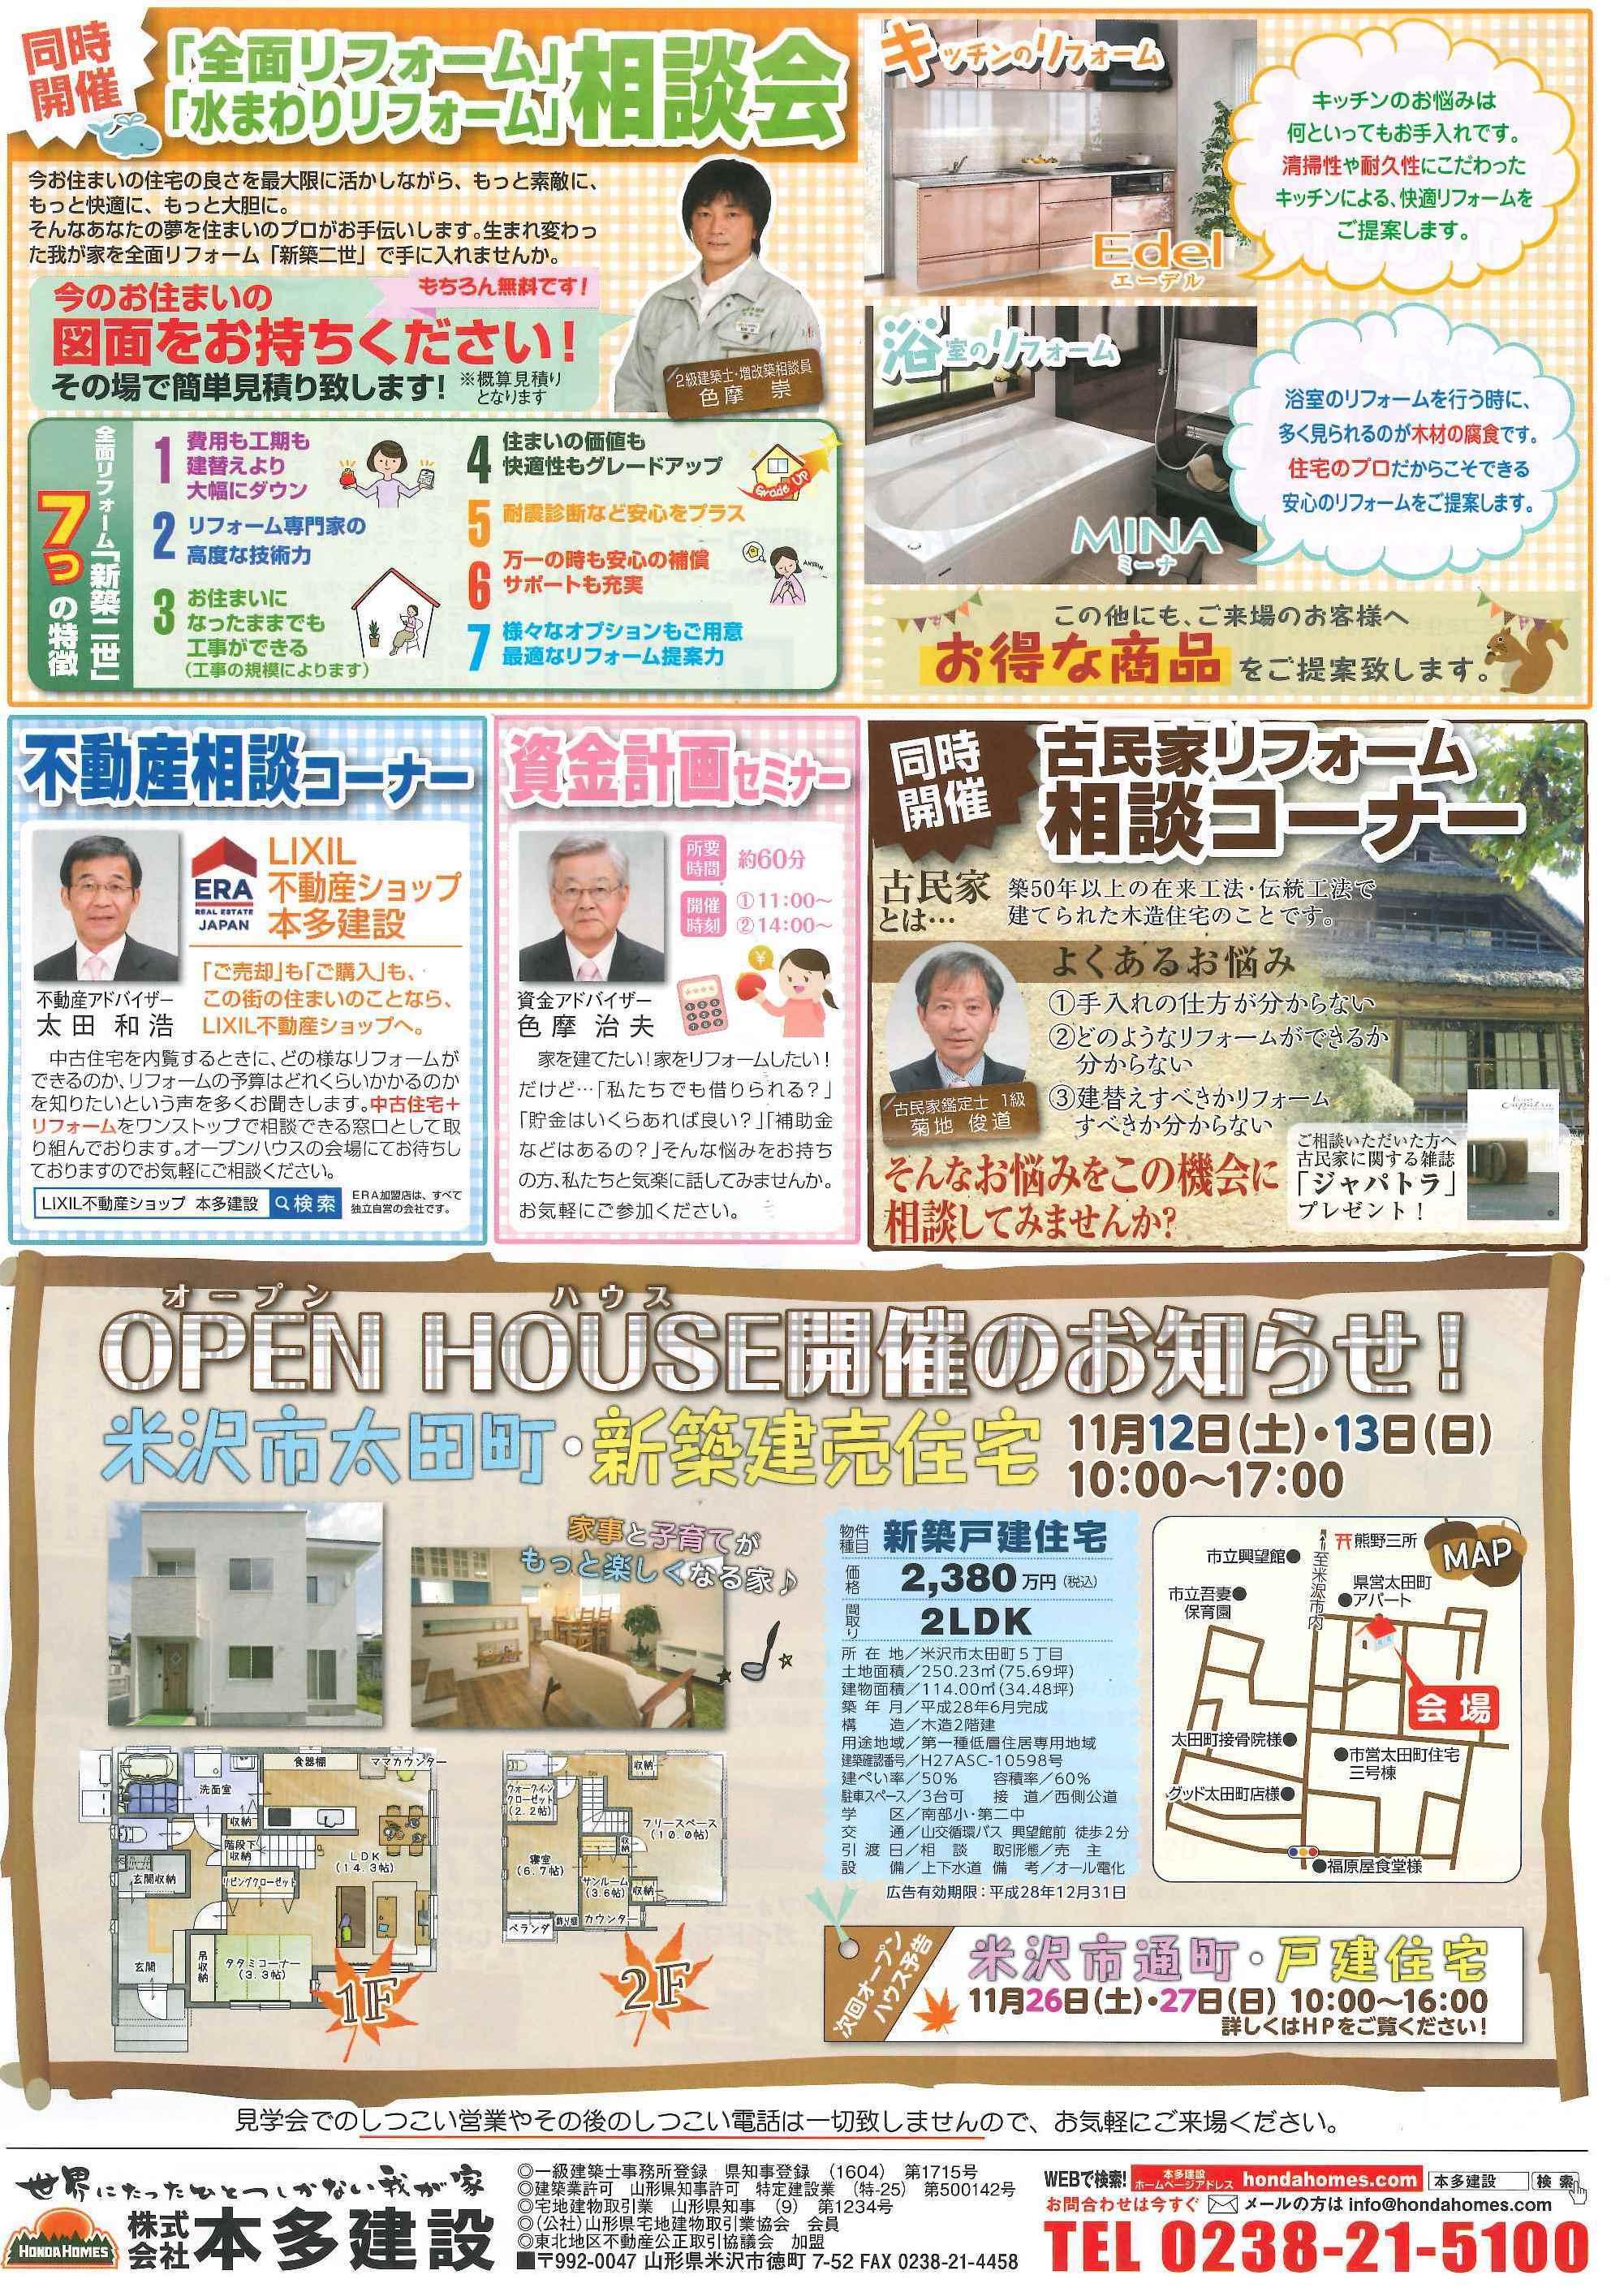 https://lixil-reformshop.jp/shop/SP00000487/20161101145457097_0002.jpg